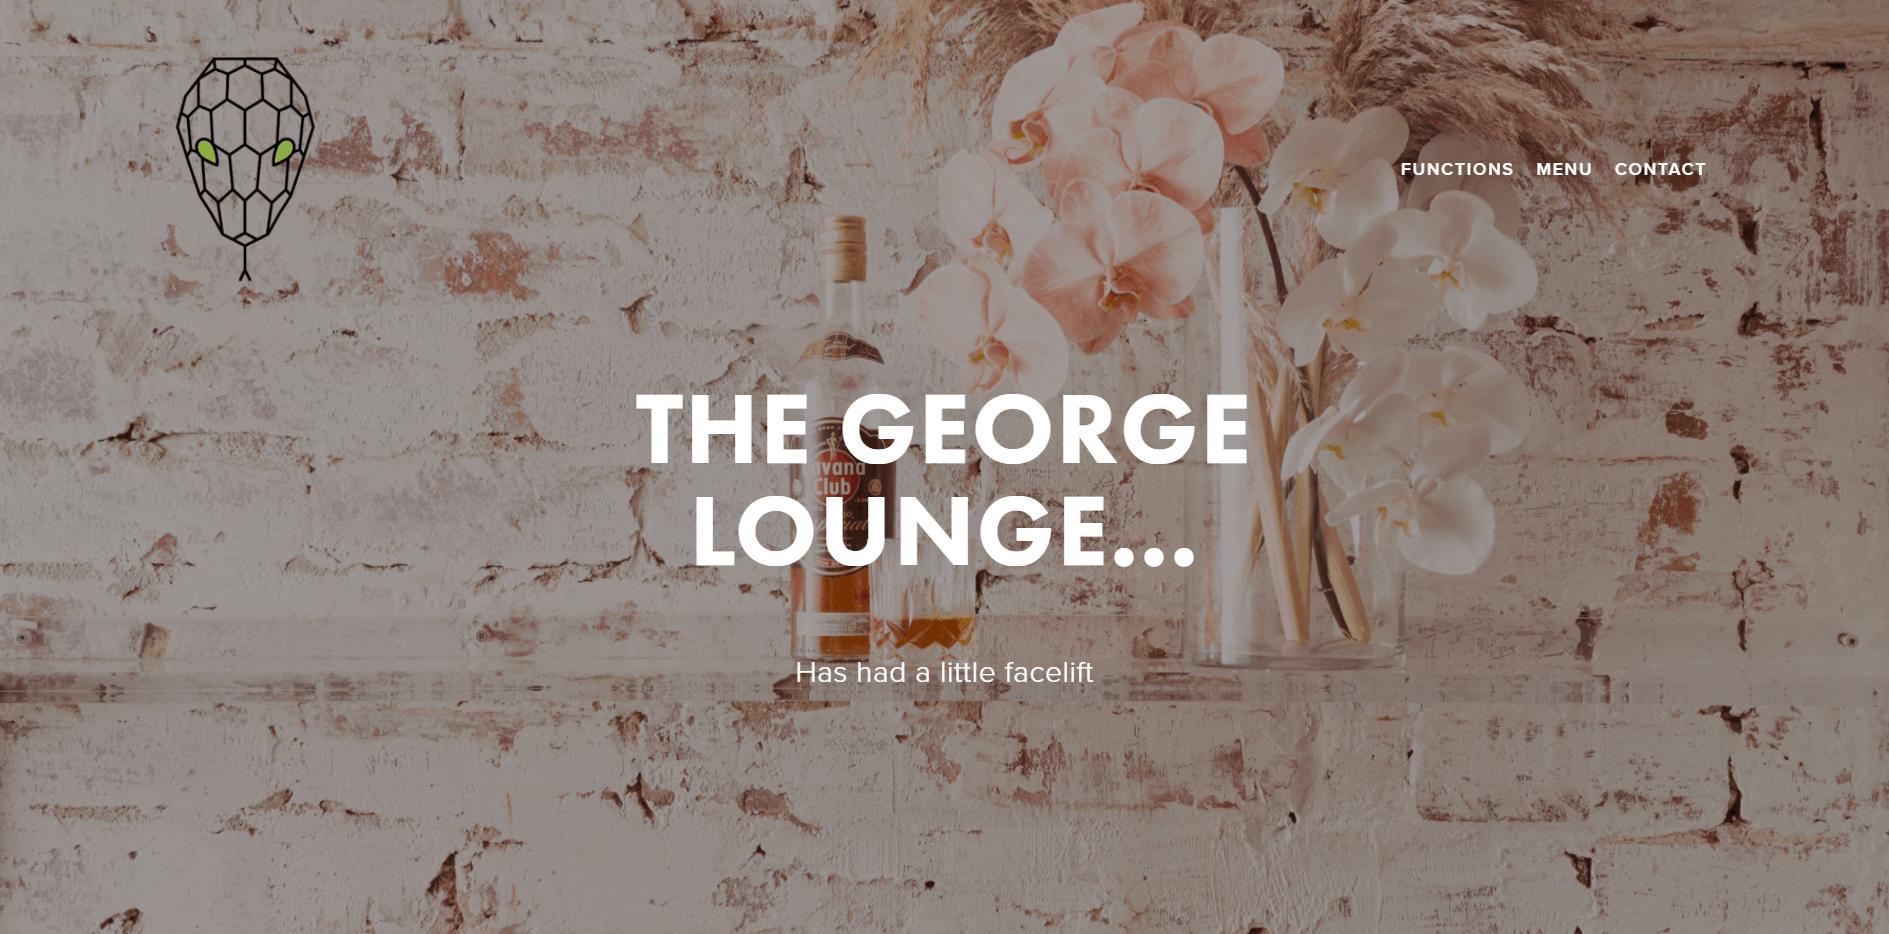 The George Lounge